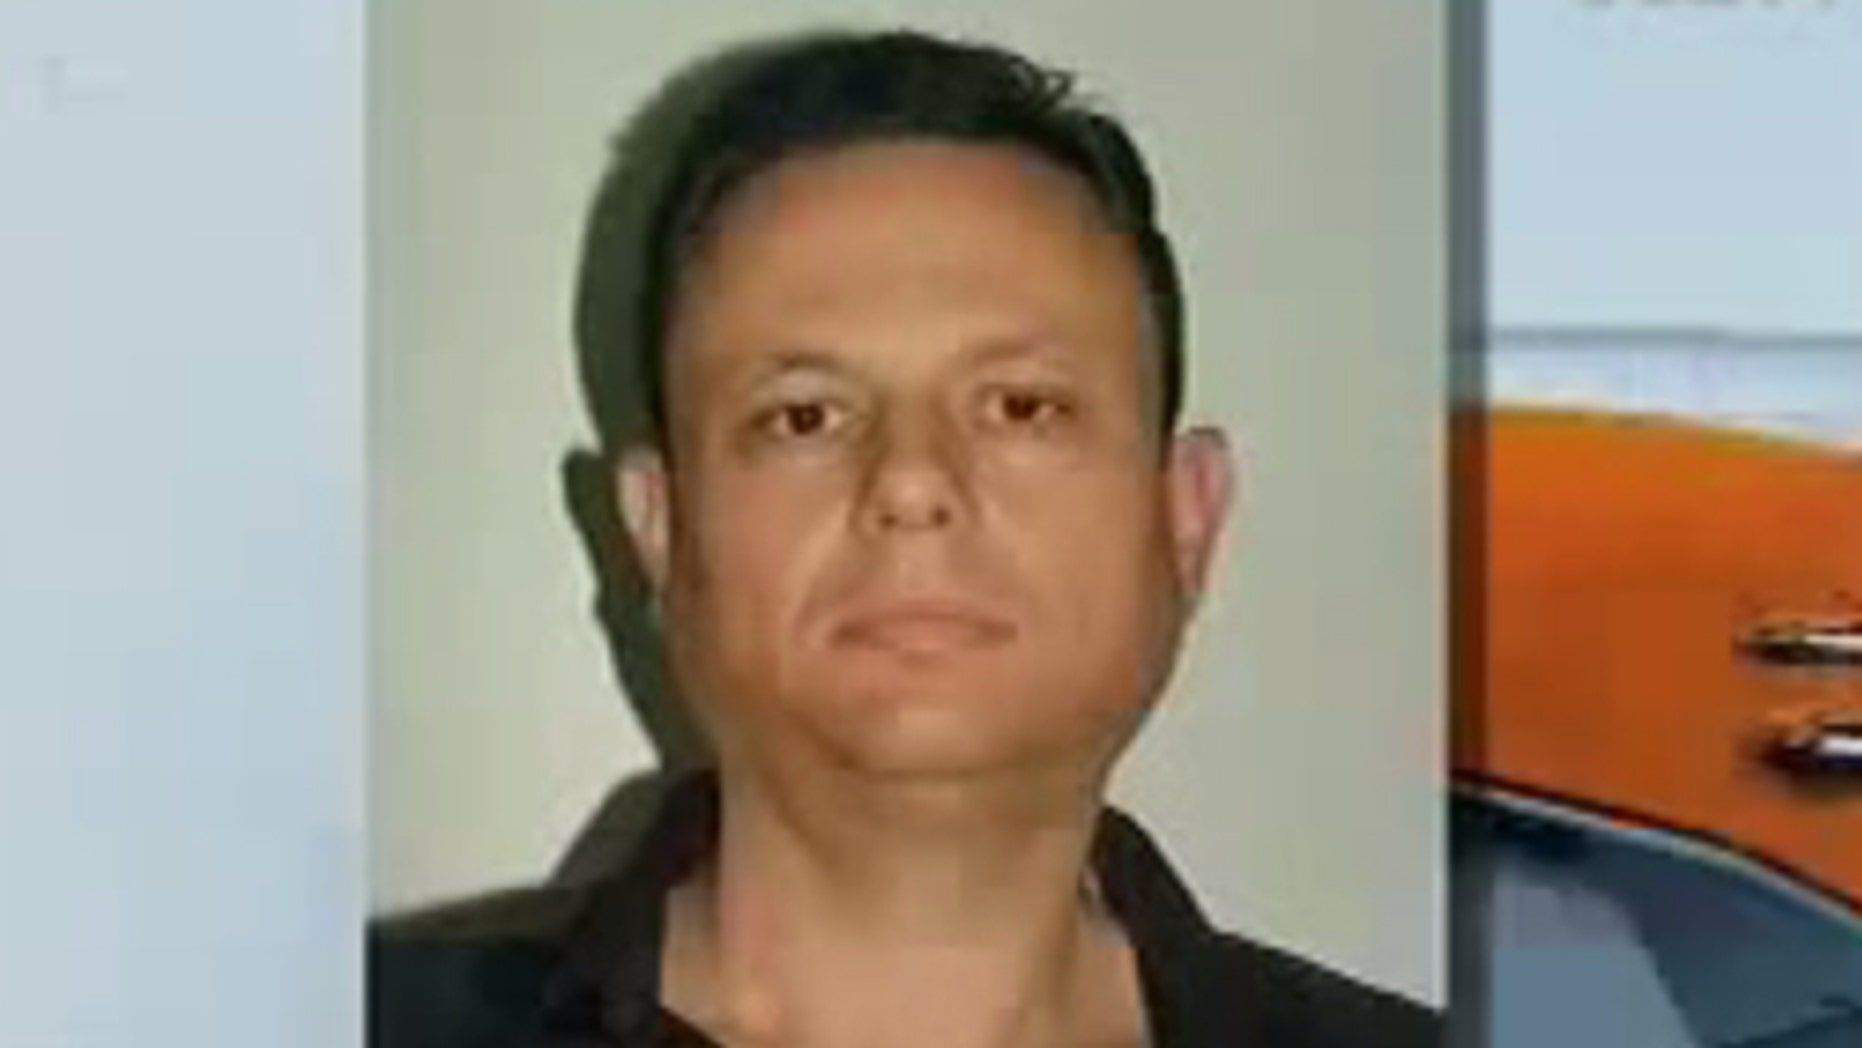 A screen grab of Mexican drug trafficker Rafael Humberto Celaya Valenzuela.